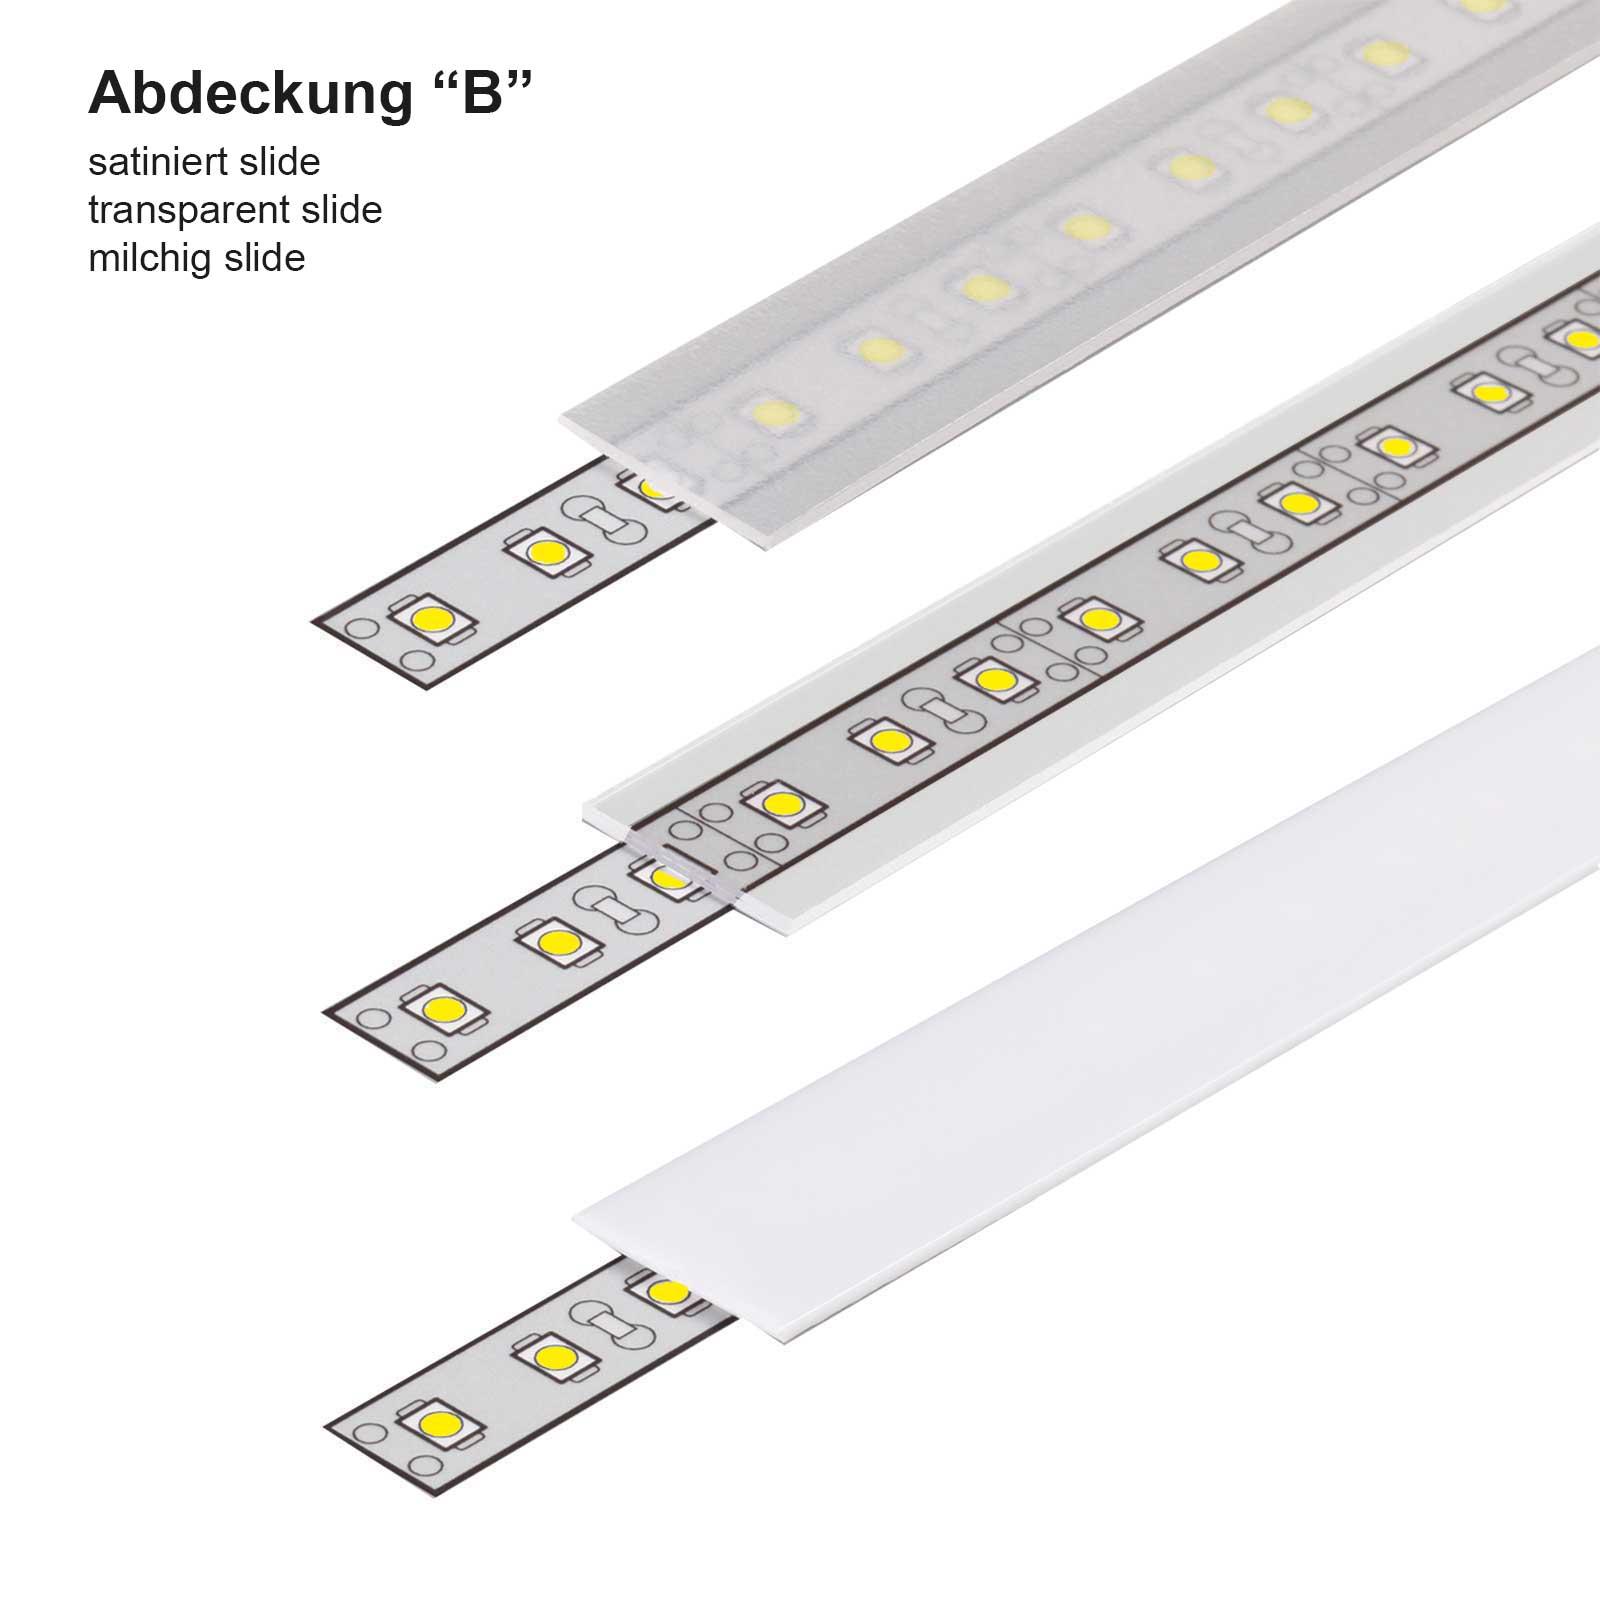 abdeckung 1-2 Meter LED Aufbauprofil SURFACE (SU) - U-Profil